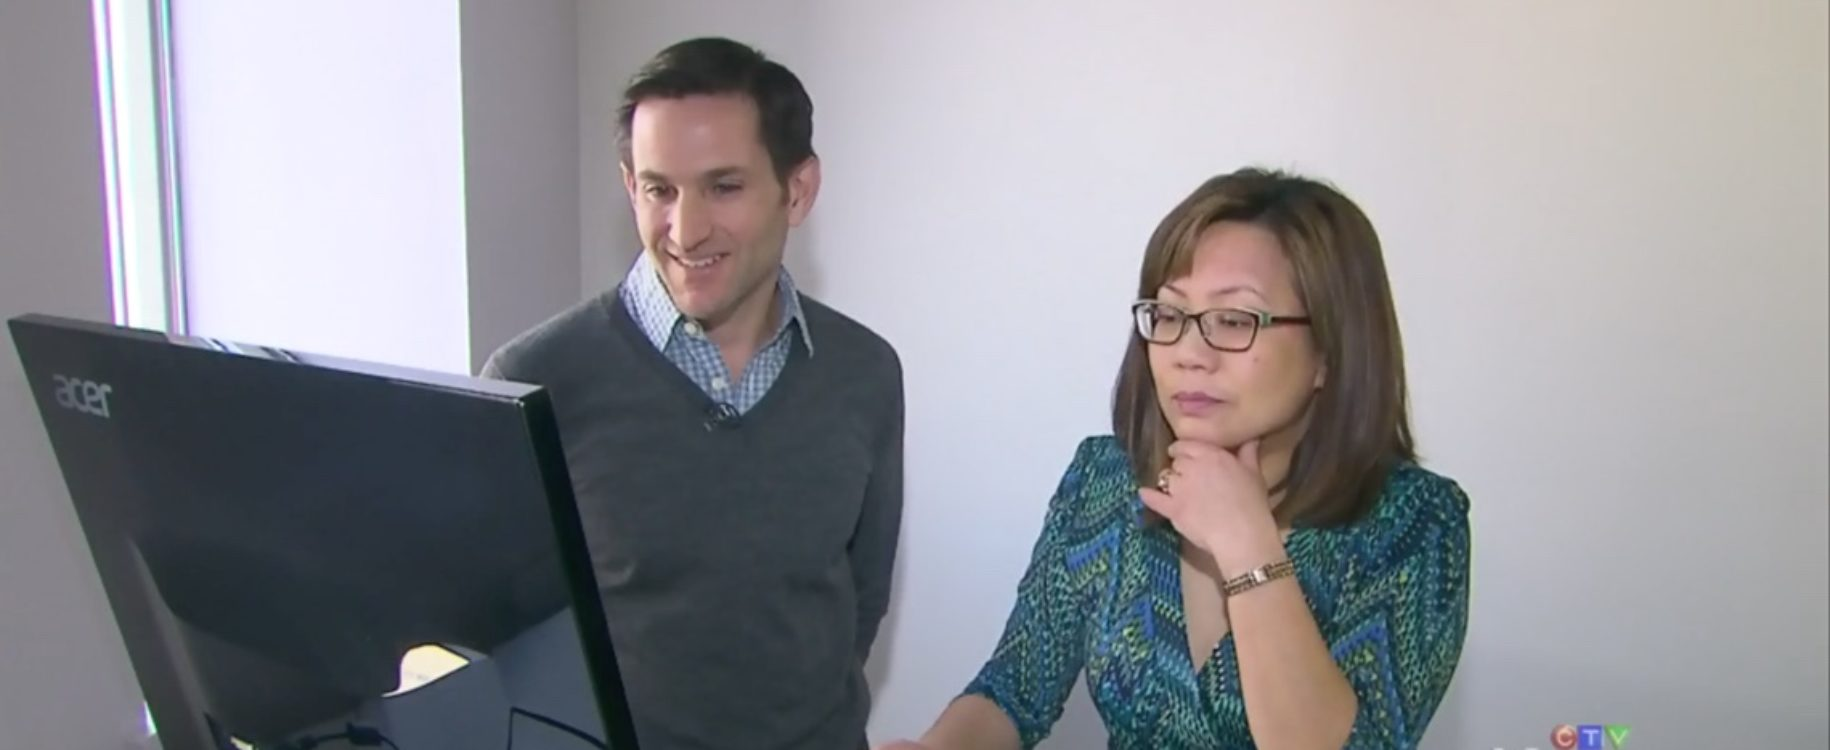 CTV Toronto: Speedy medical service